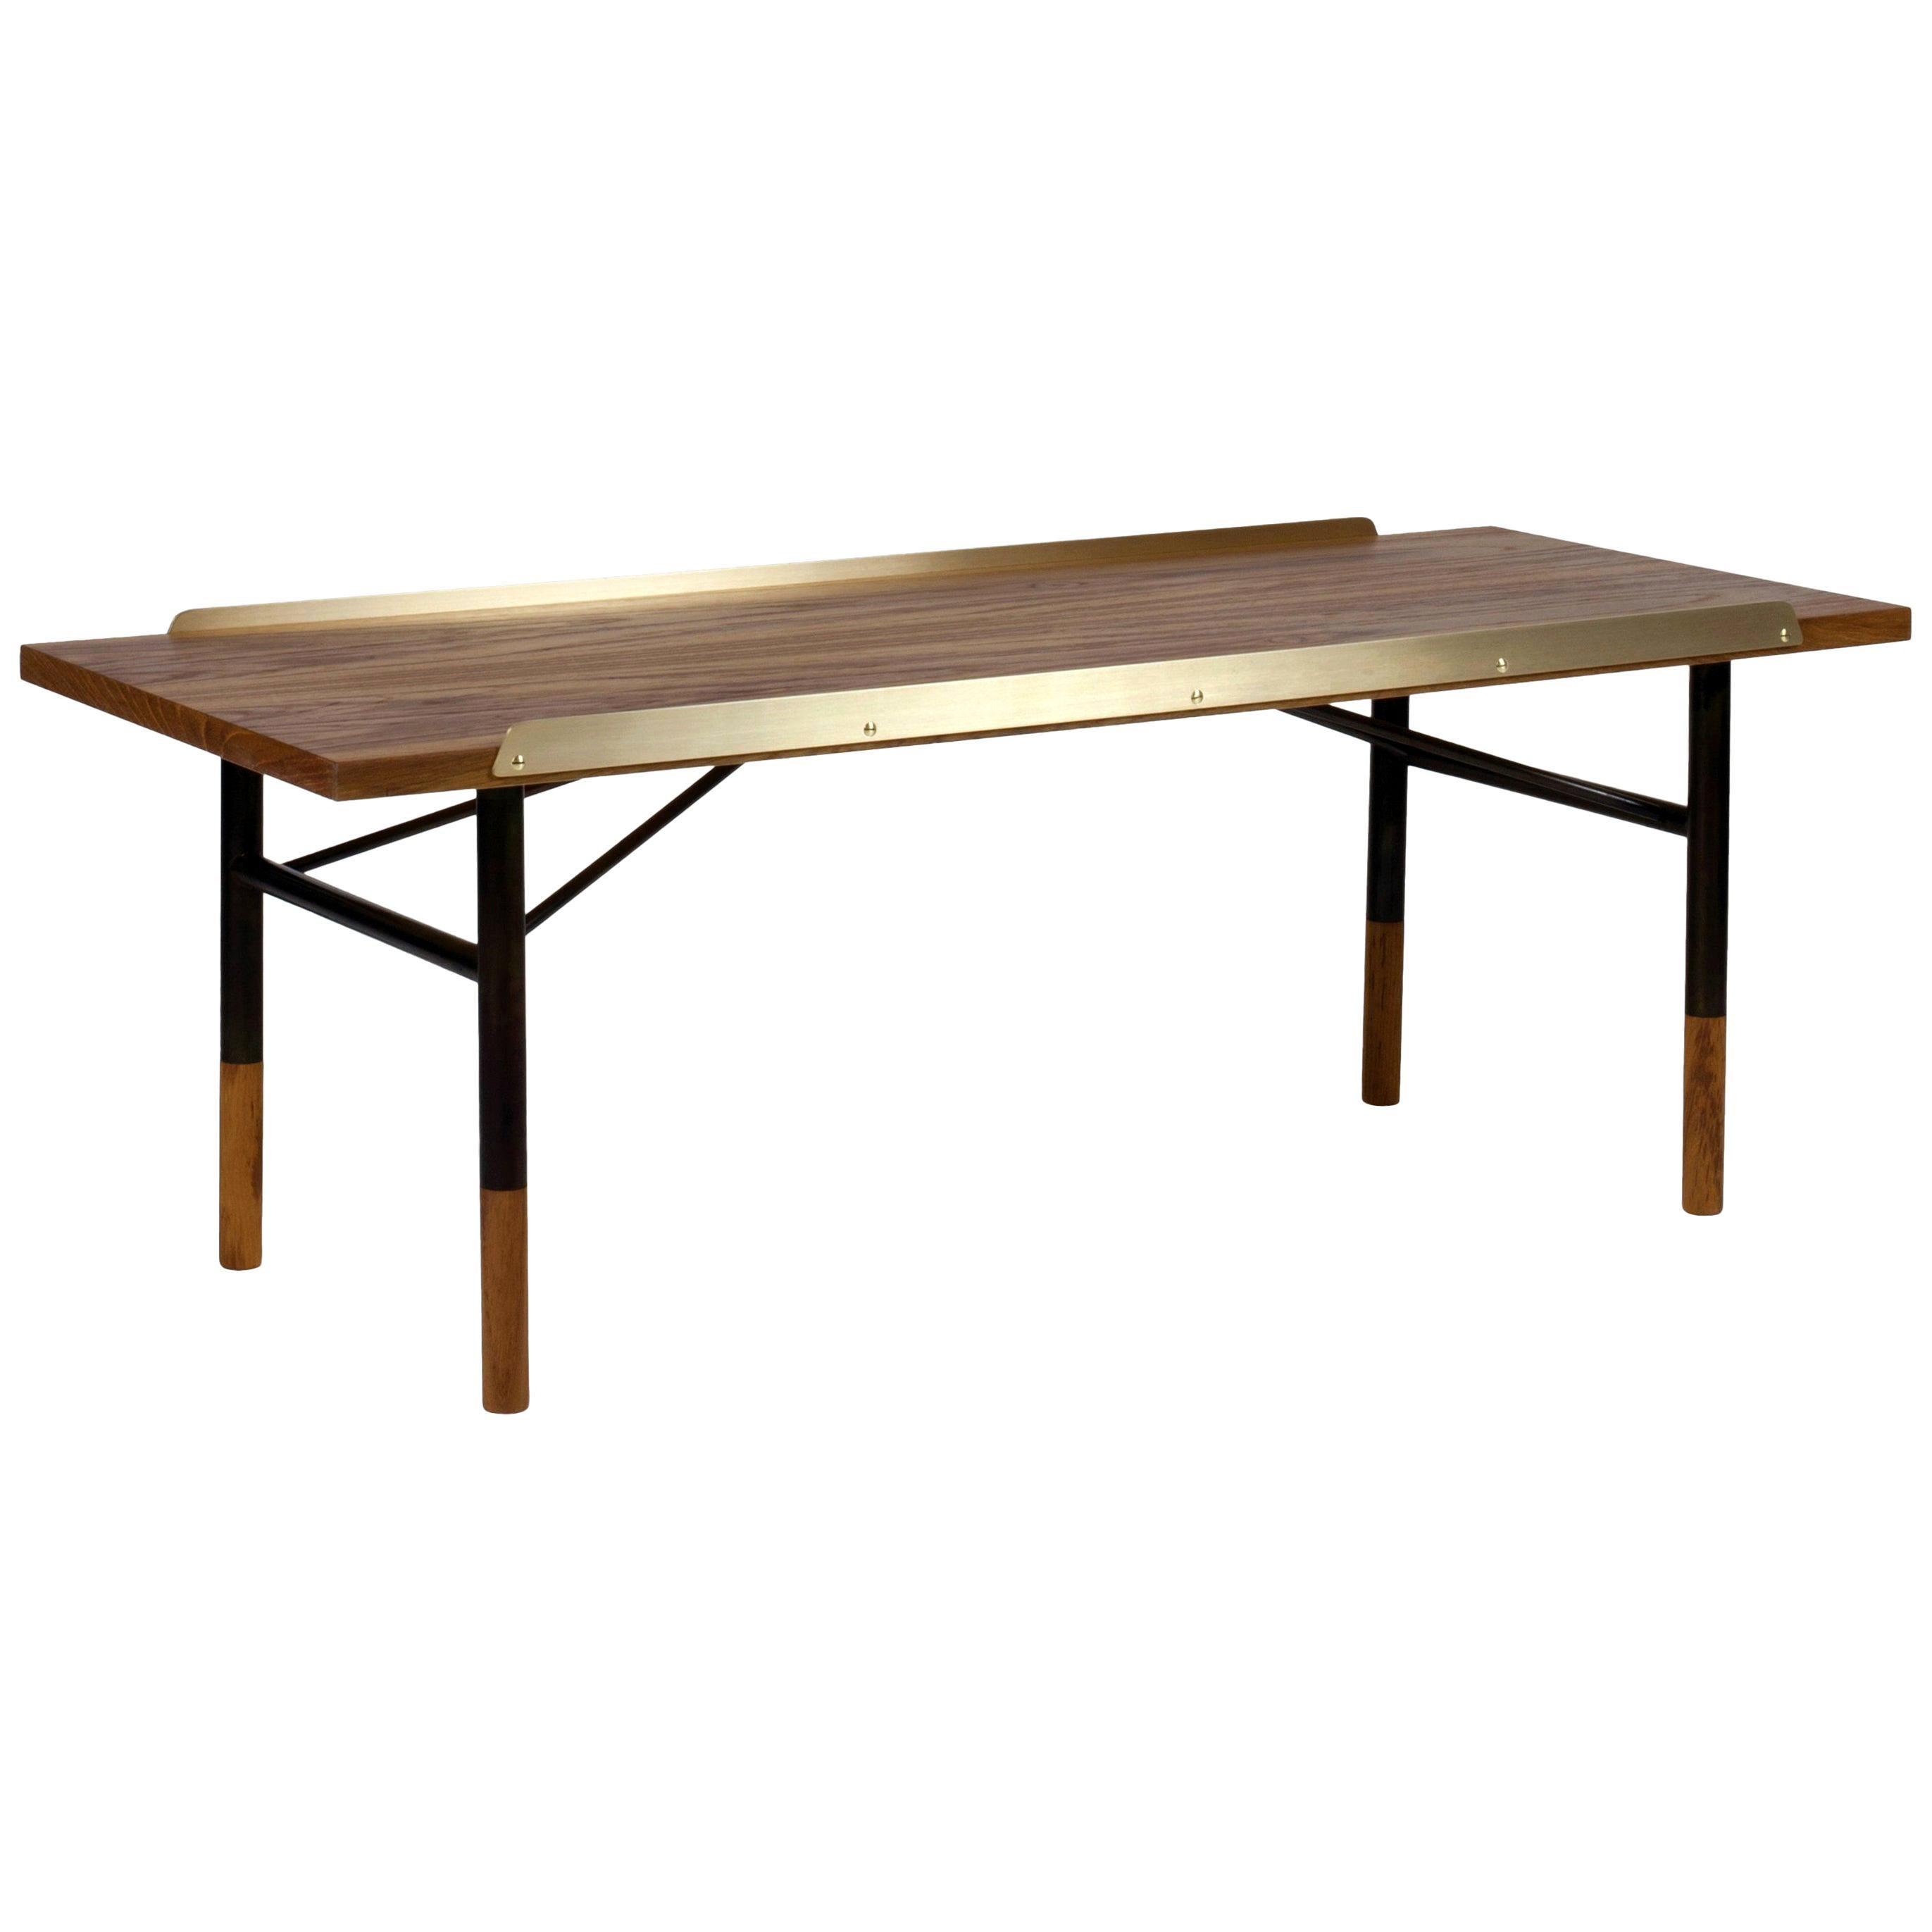 Finn Juhl Table Bench, Wood and Brass